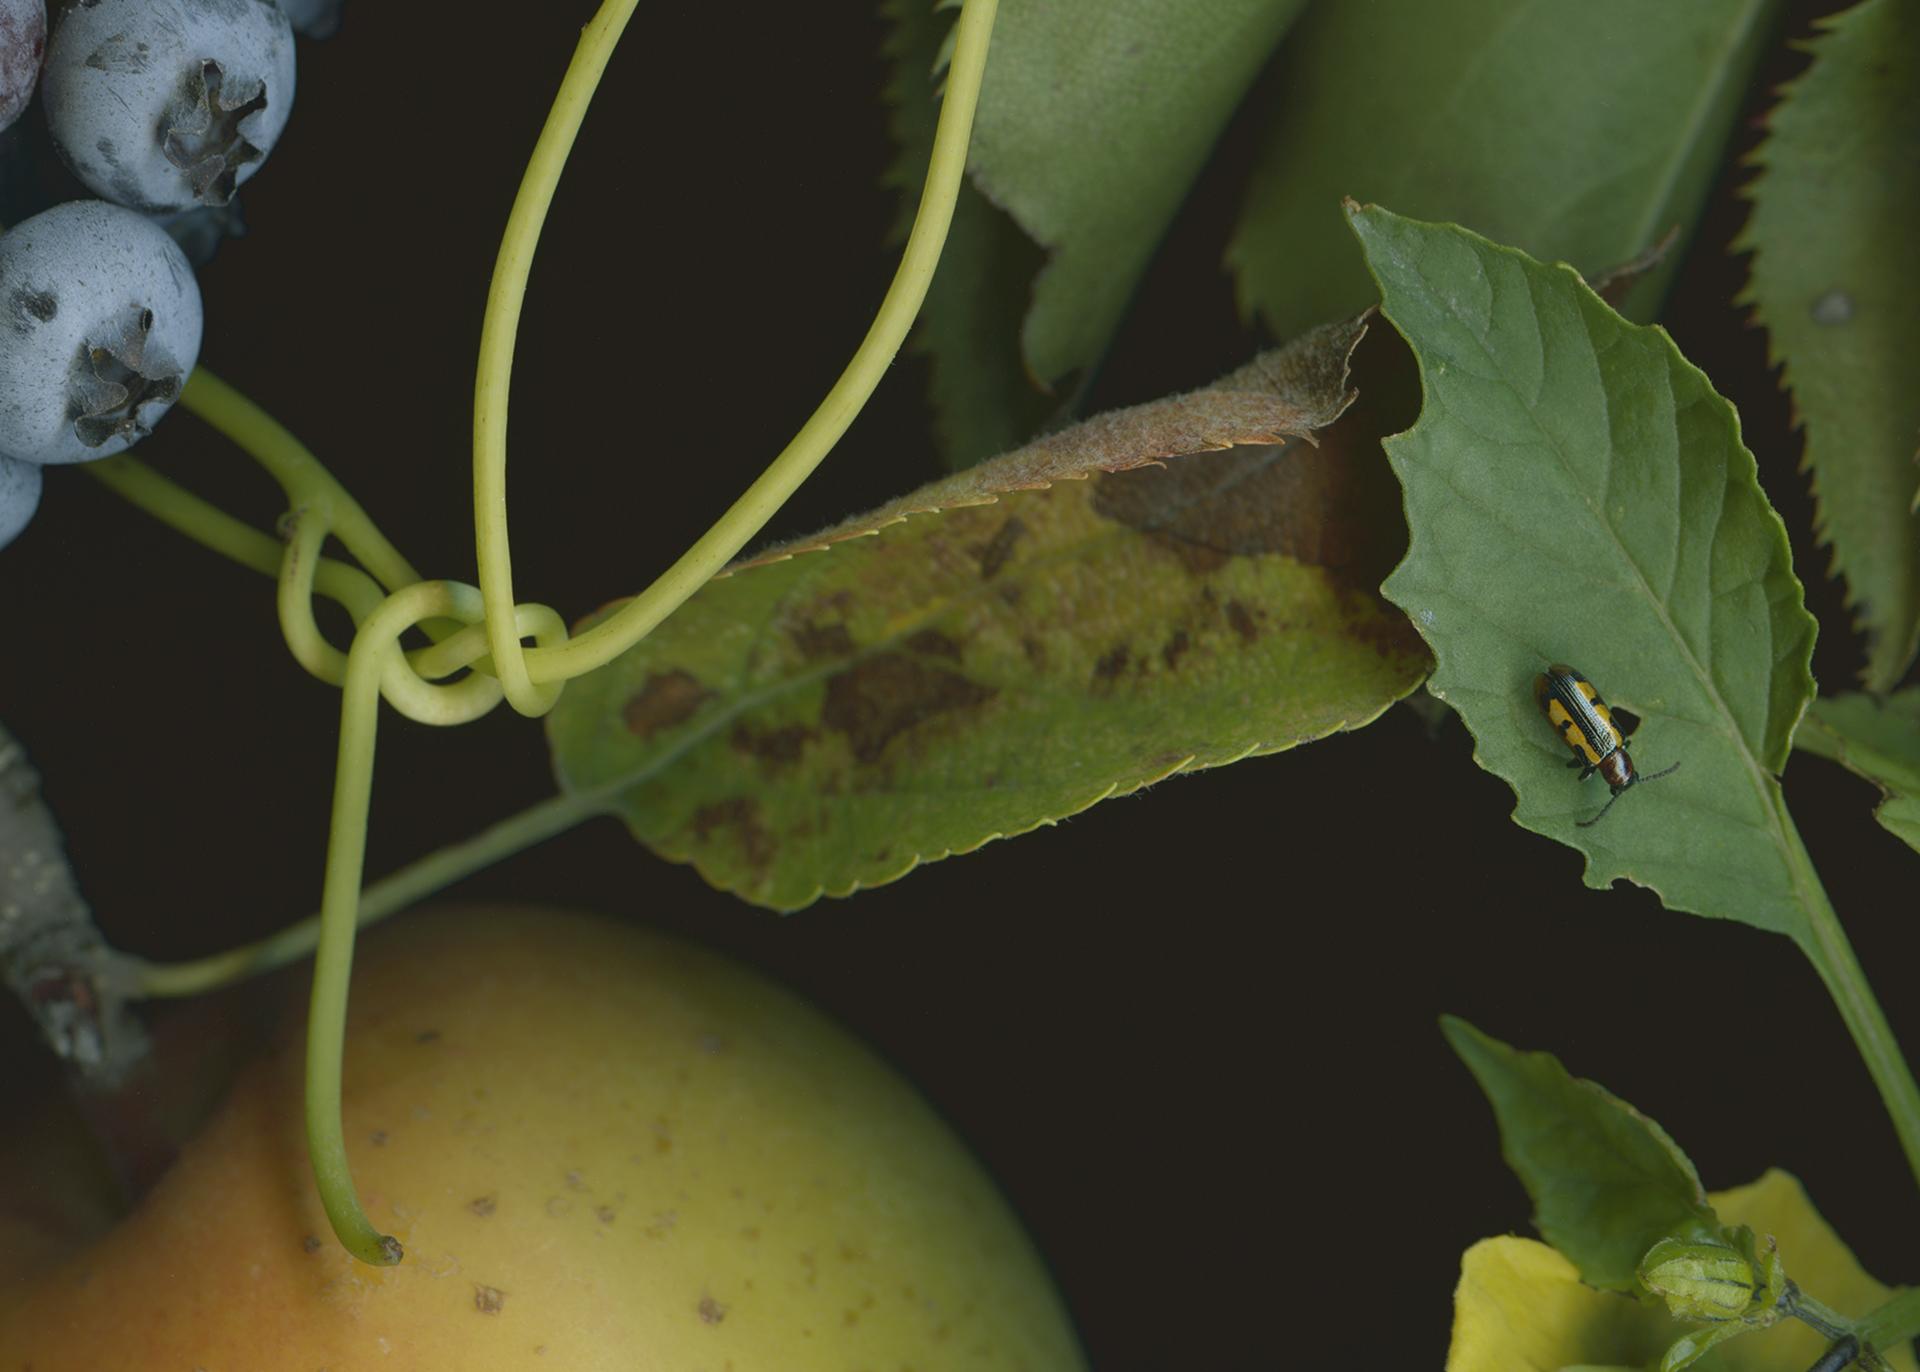 Detail of Blueberries, Blackberries, and Indigo Pear Drops